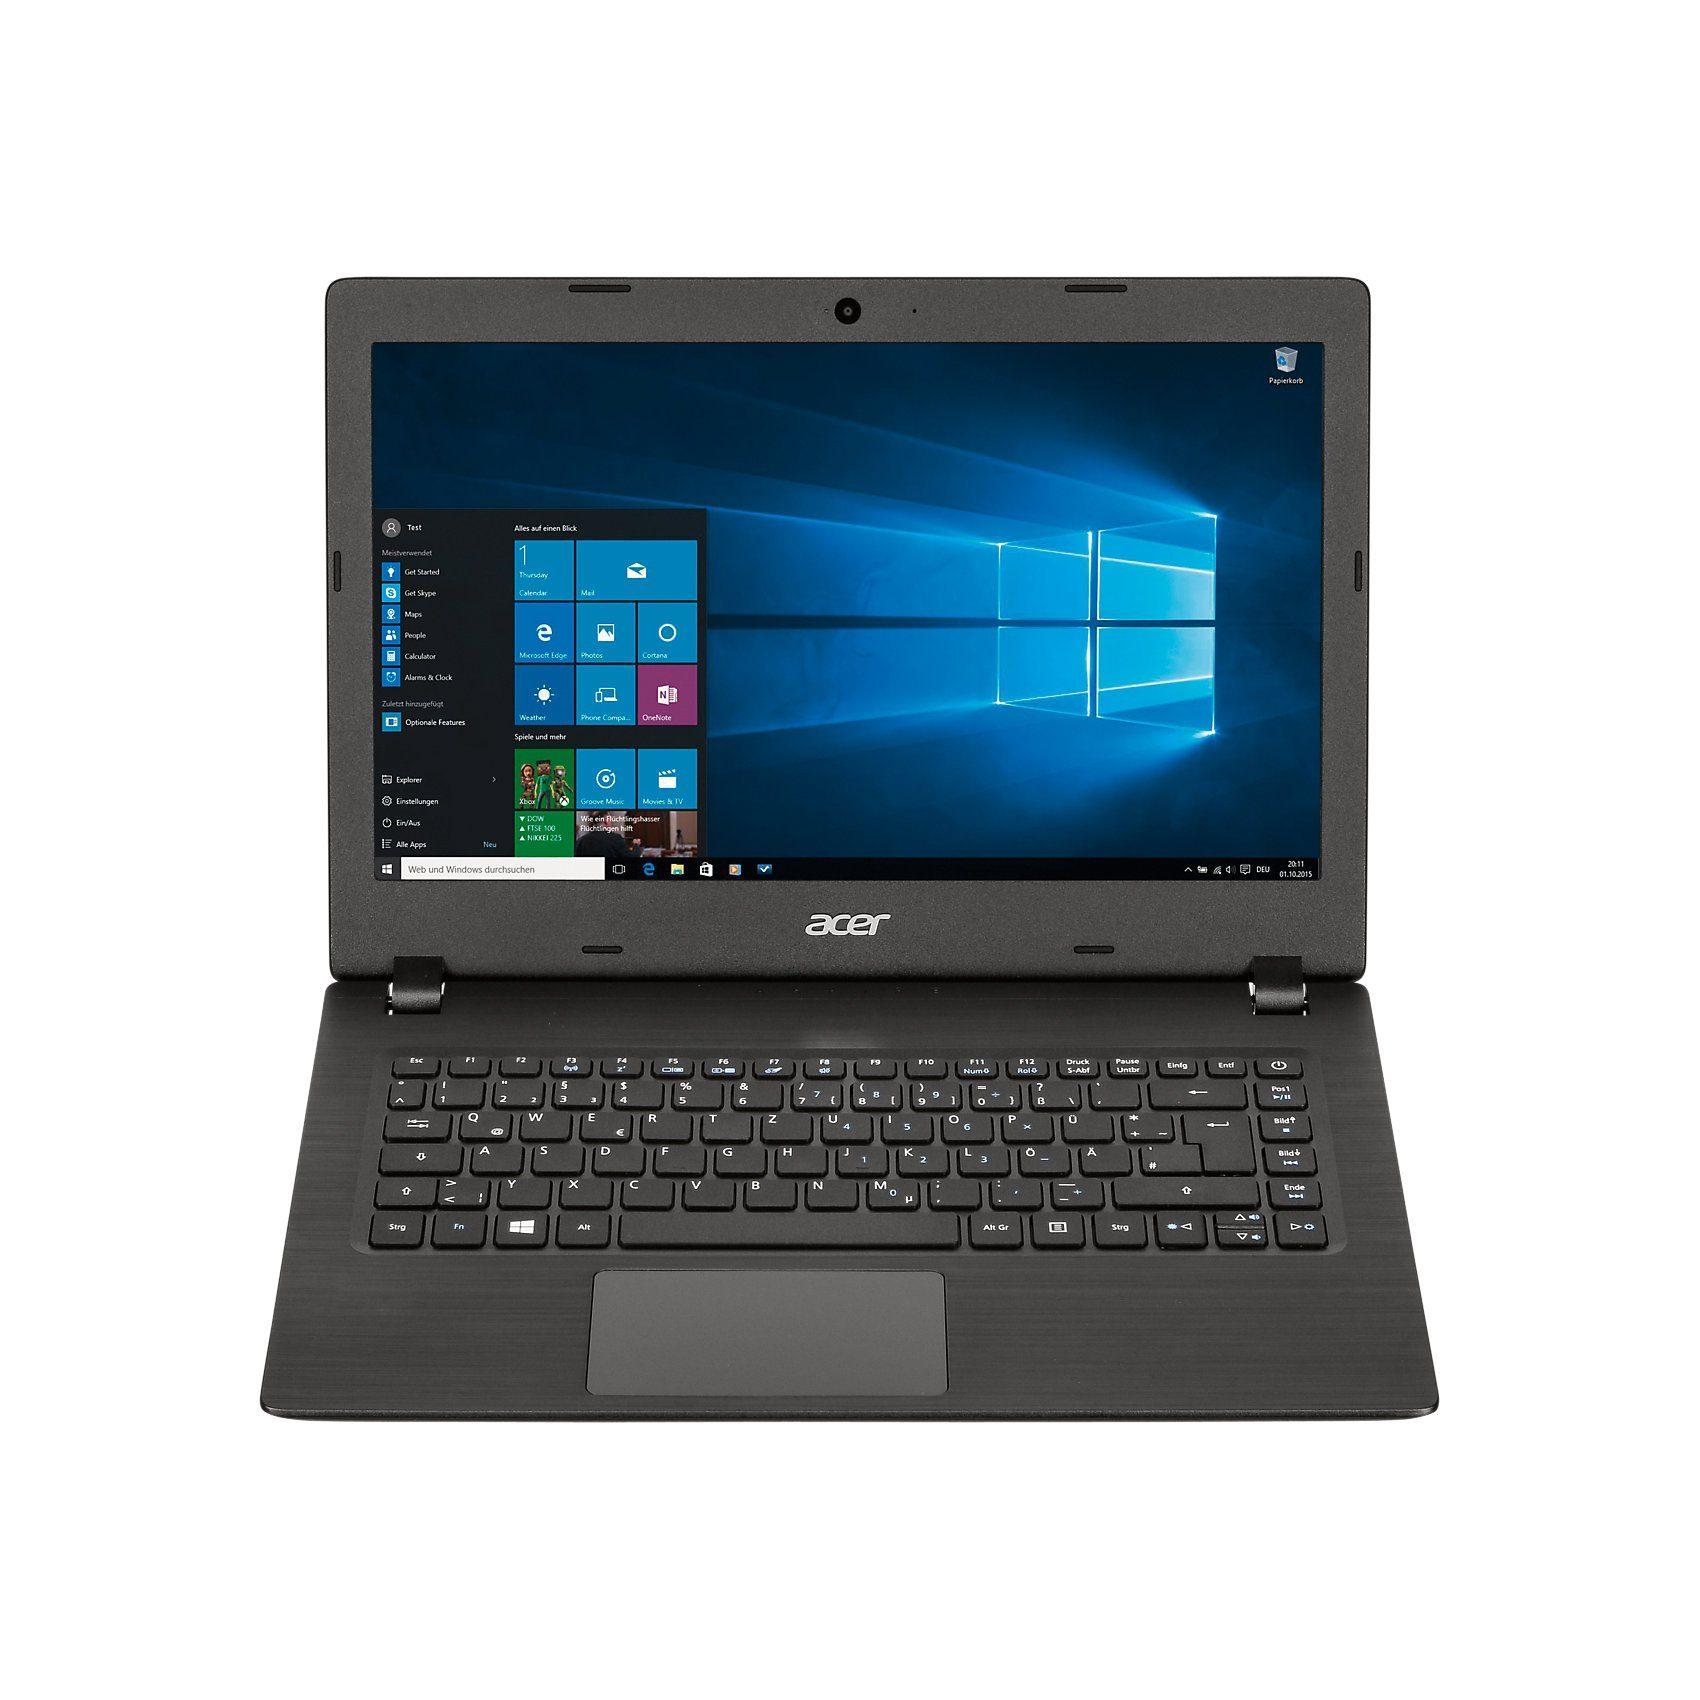 Acer Aspire A114-31-P908 35,56cm (14) 4GB 64GB Win 10